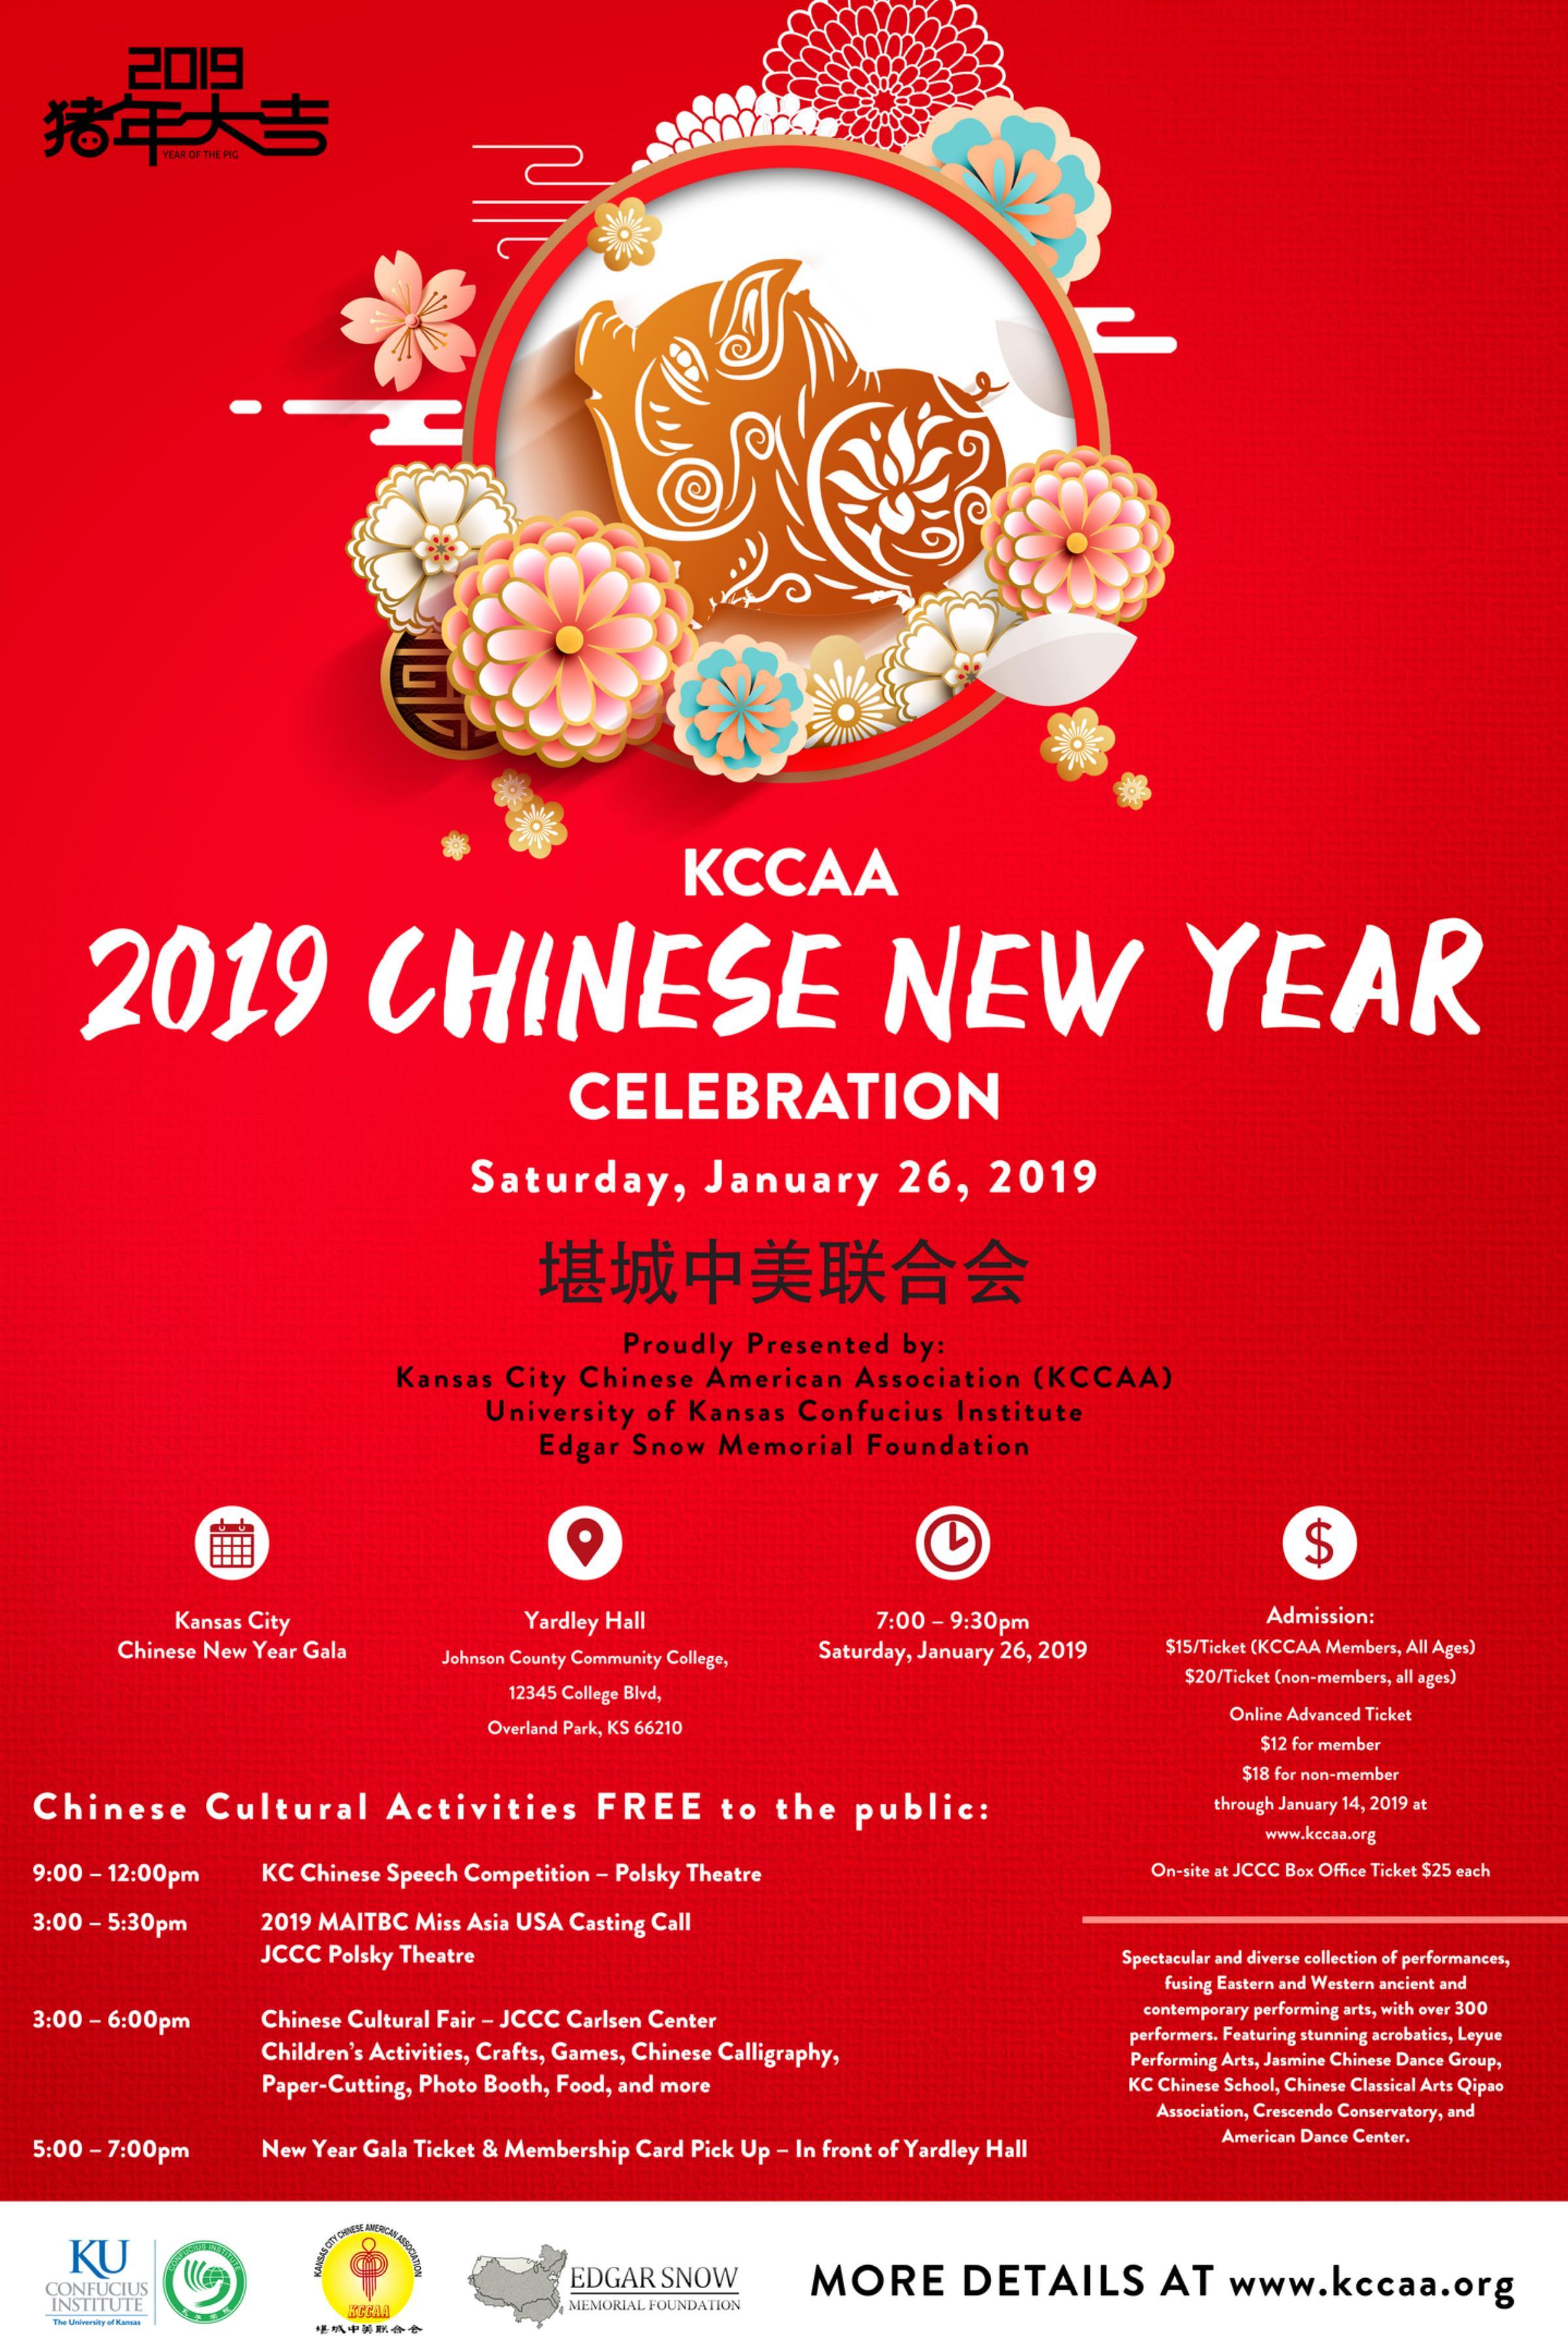 Kccaa Chinese New Year Celebration